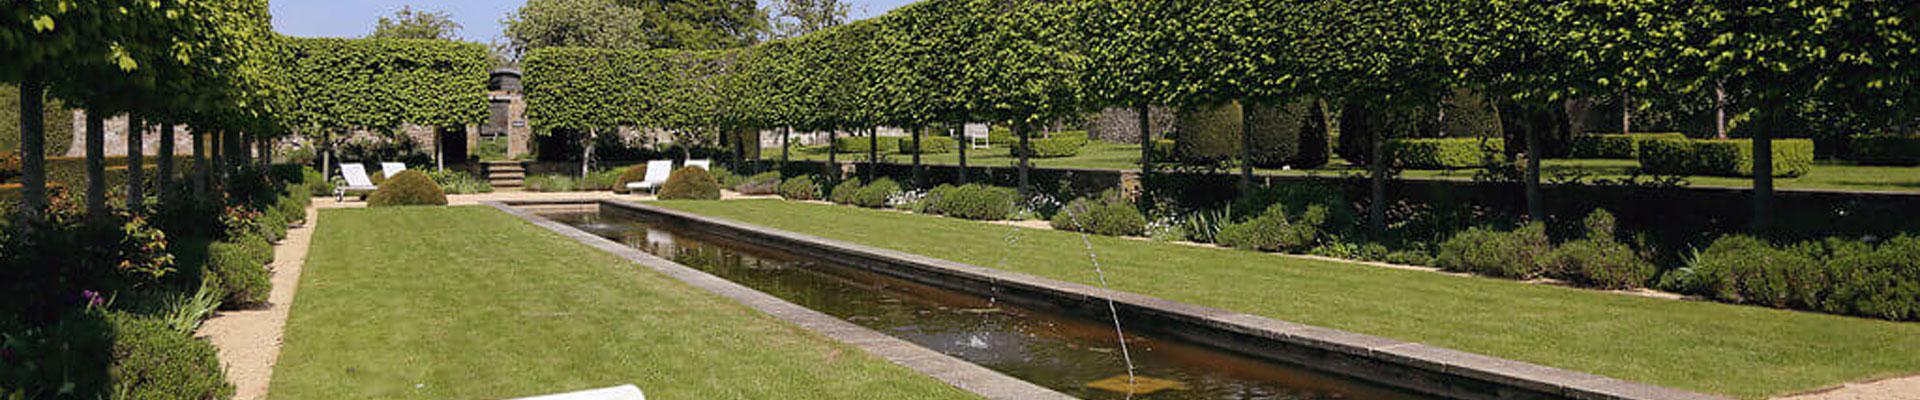 Photo of the pond at Arisan Estates